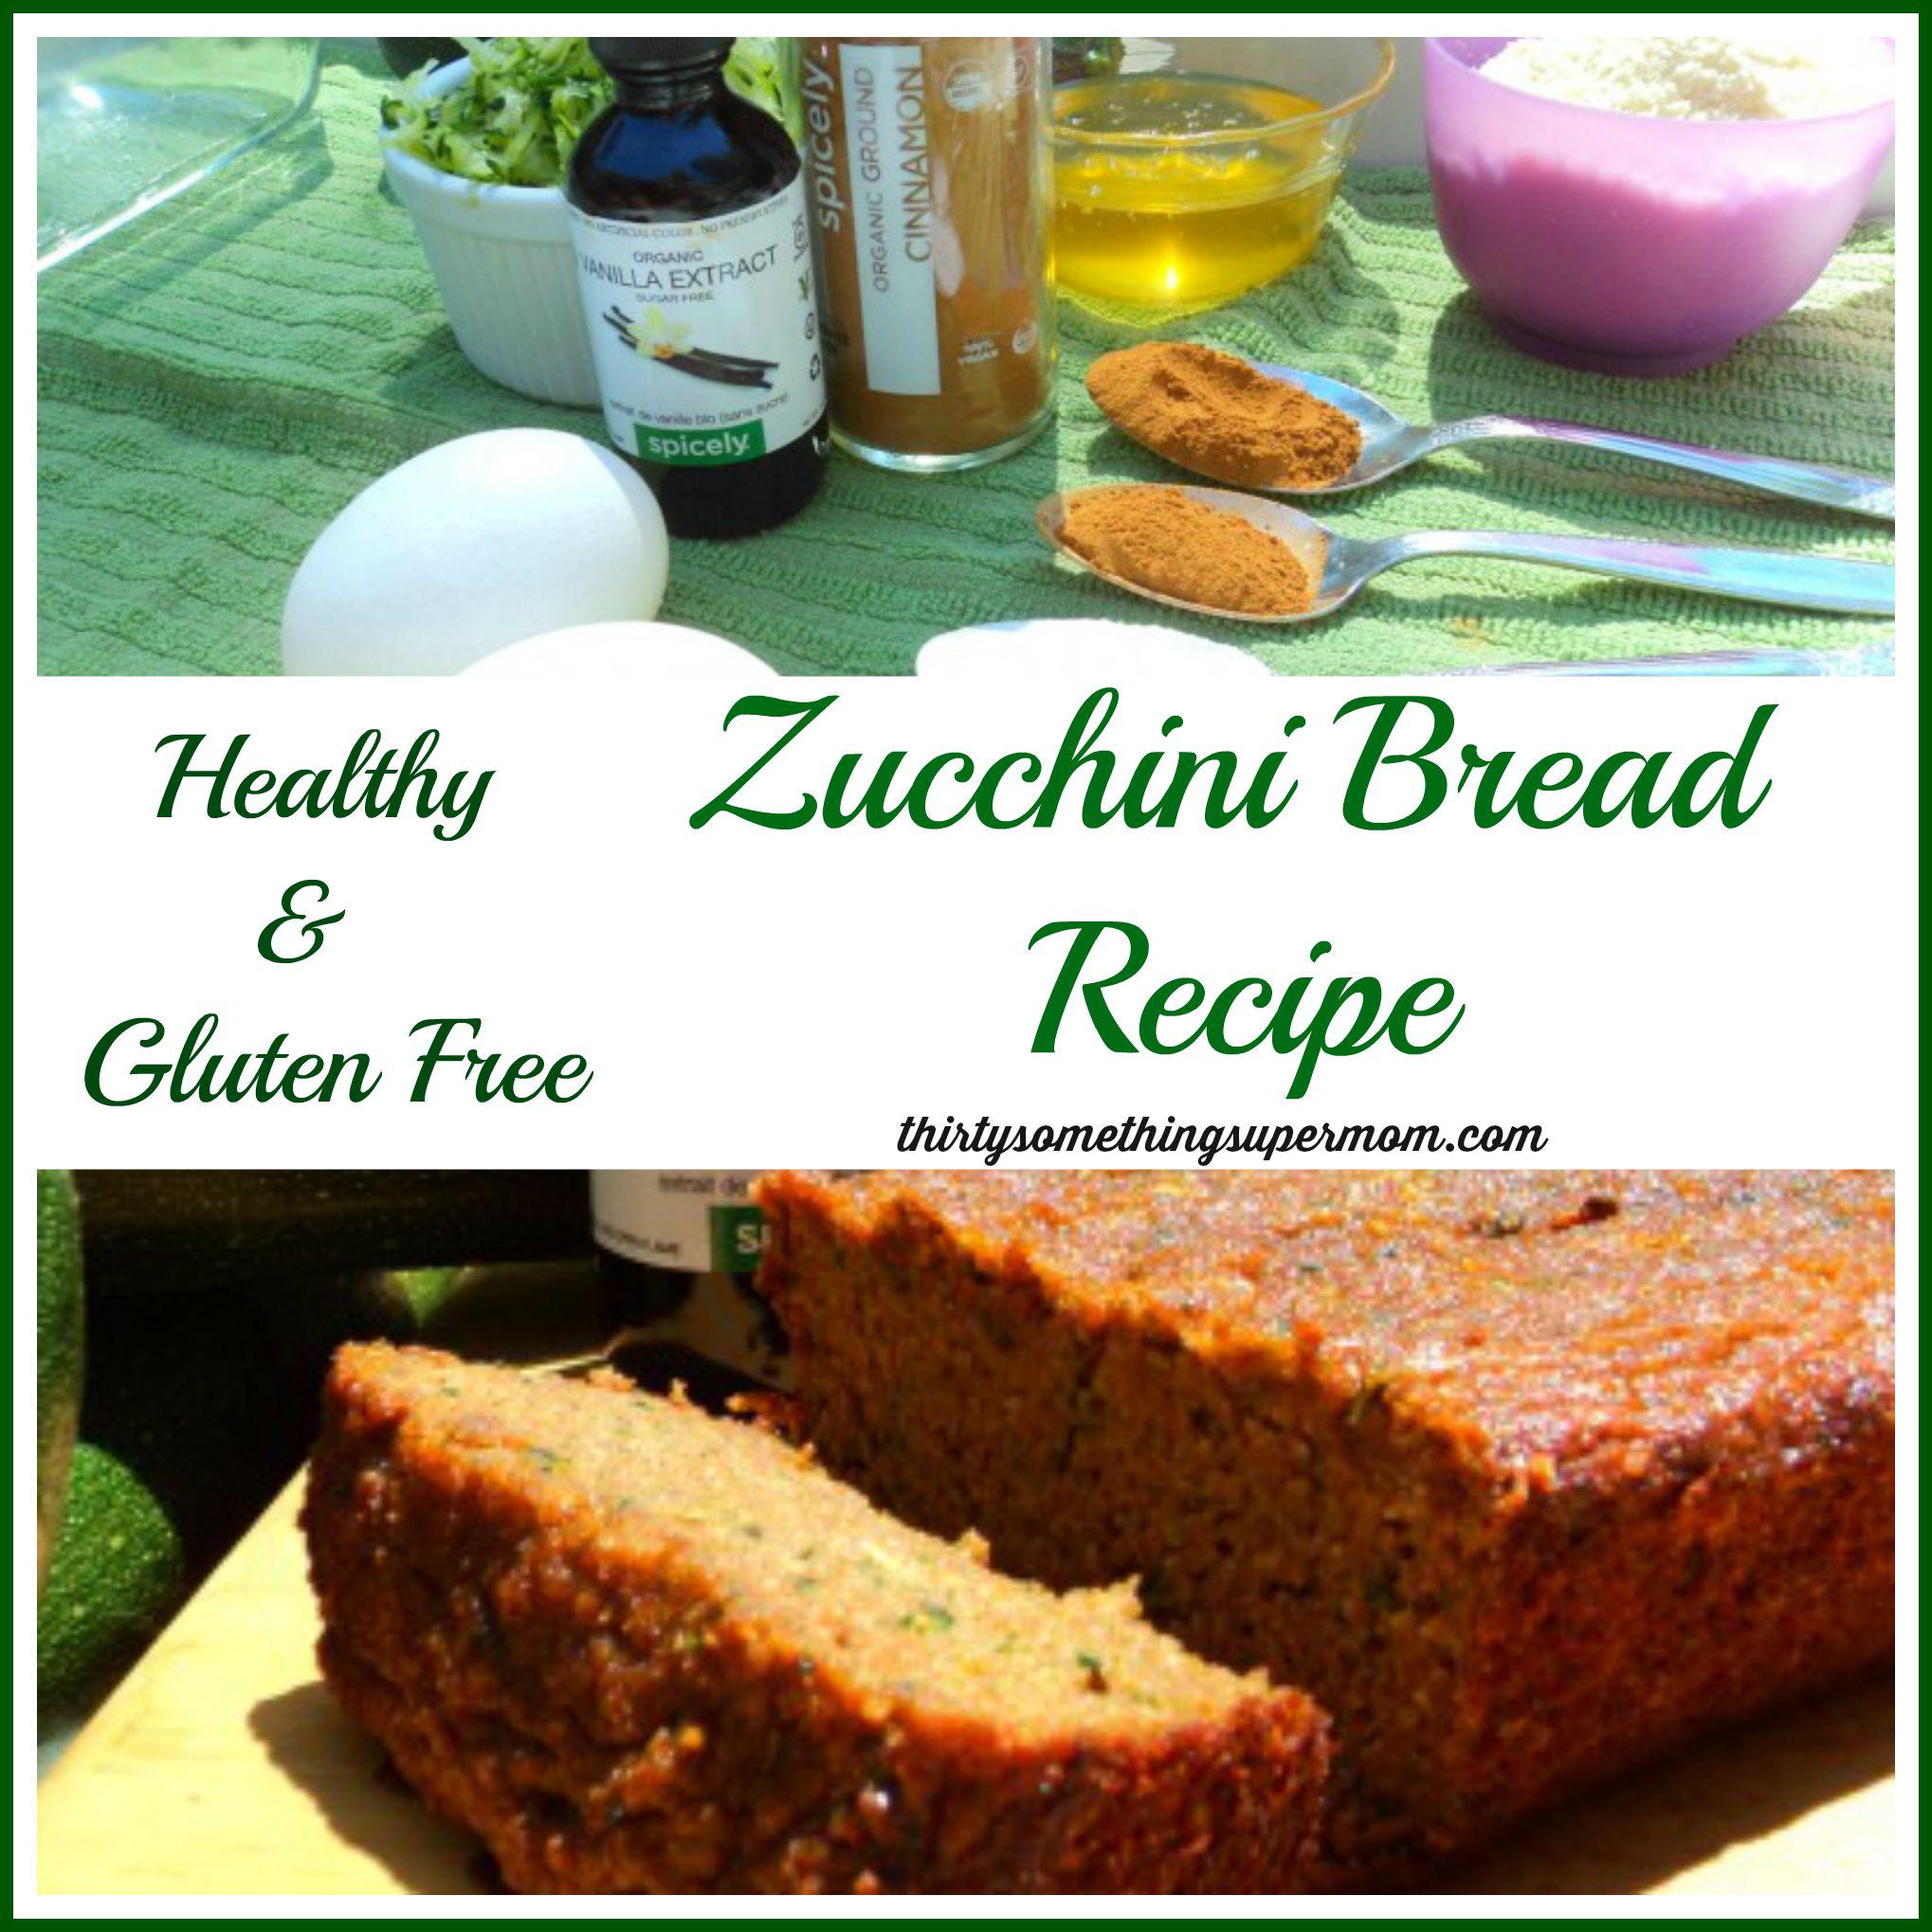 Healthy Zucchini Bread Recipe Thirtysomethingsupermom